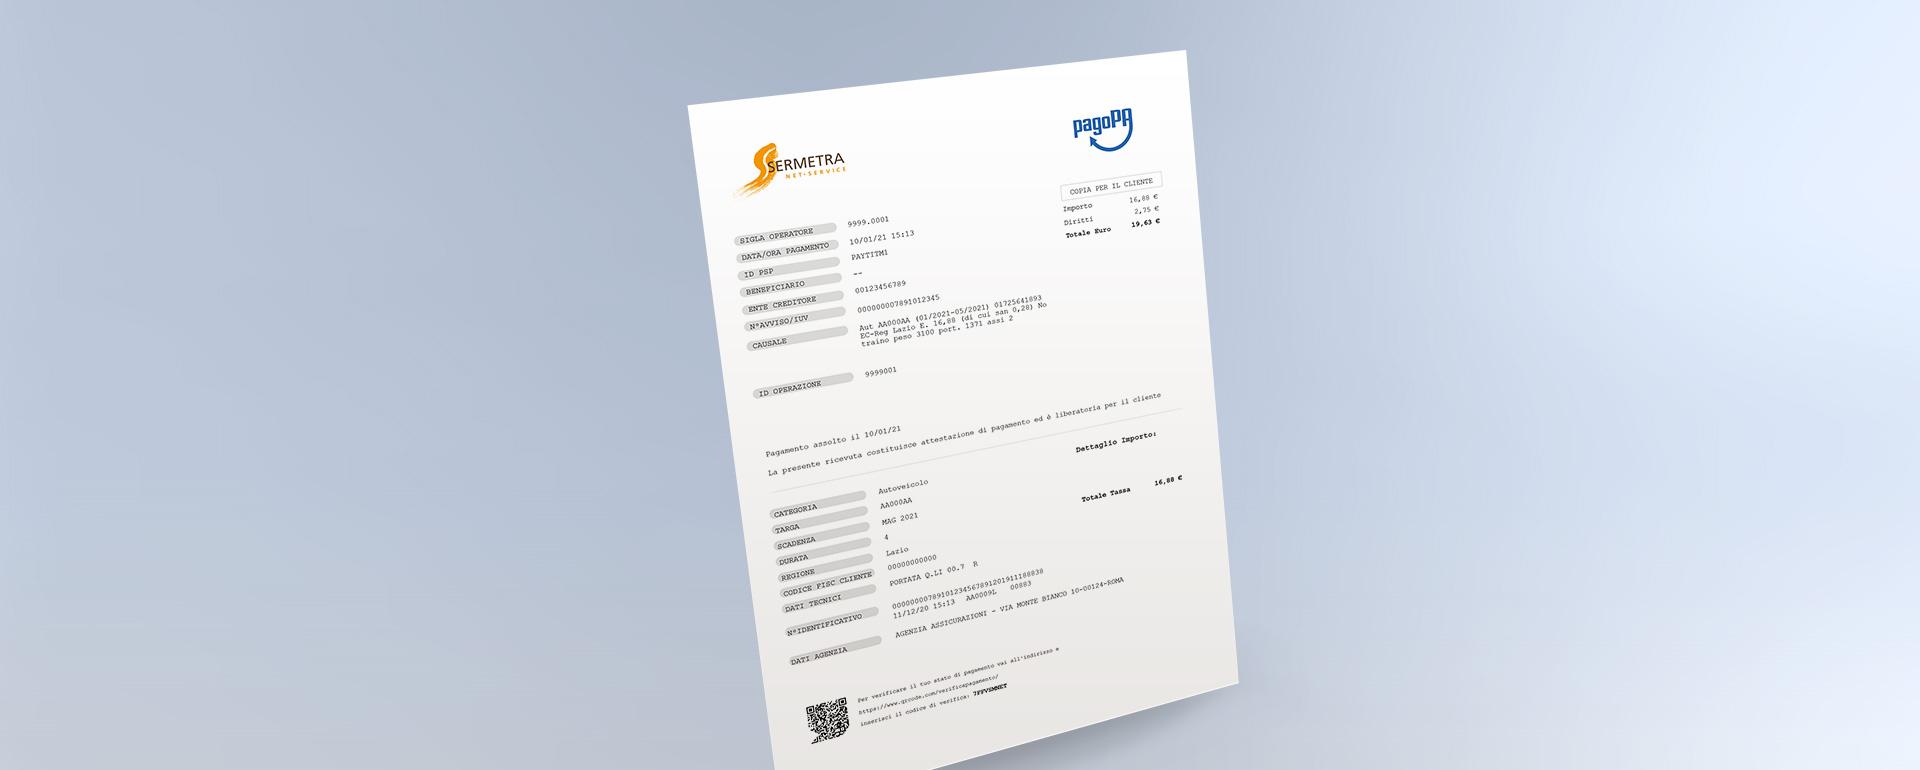 La piattaforma Pago PA di Sermetra Net